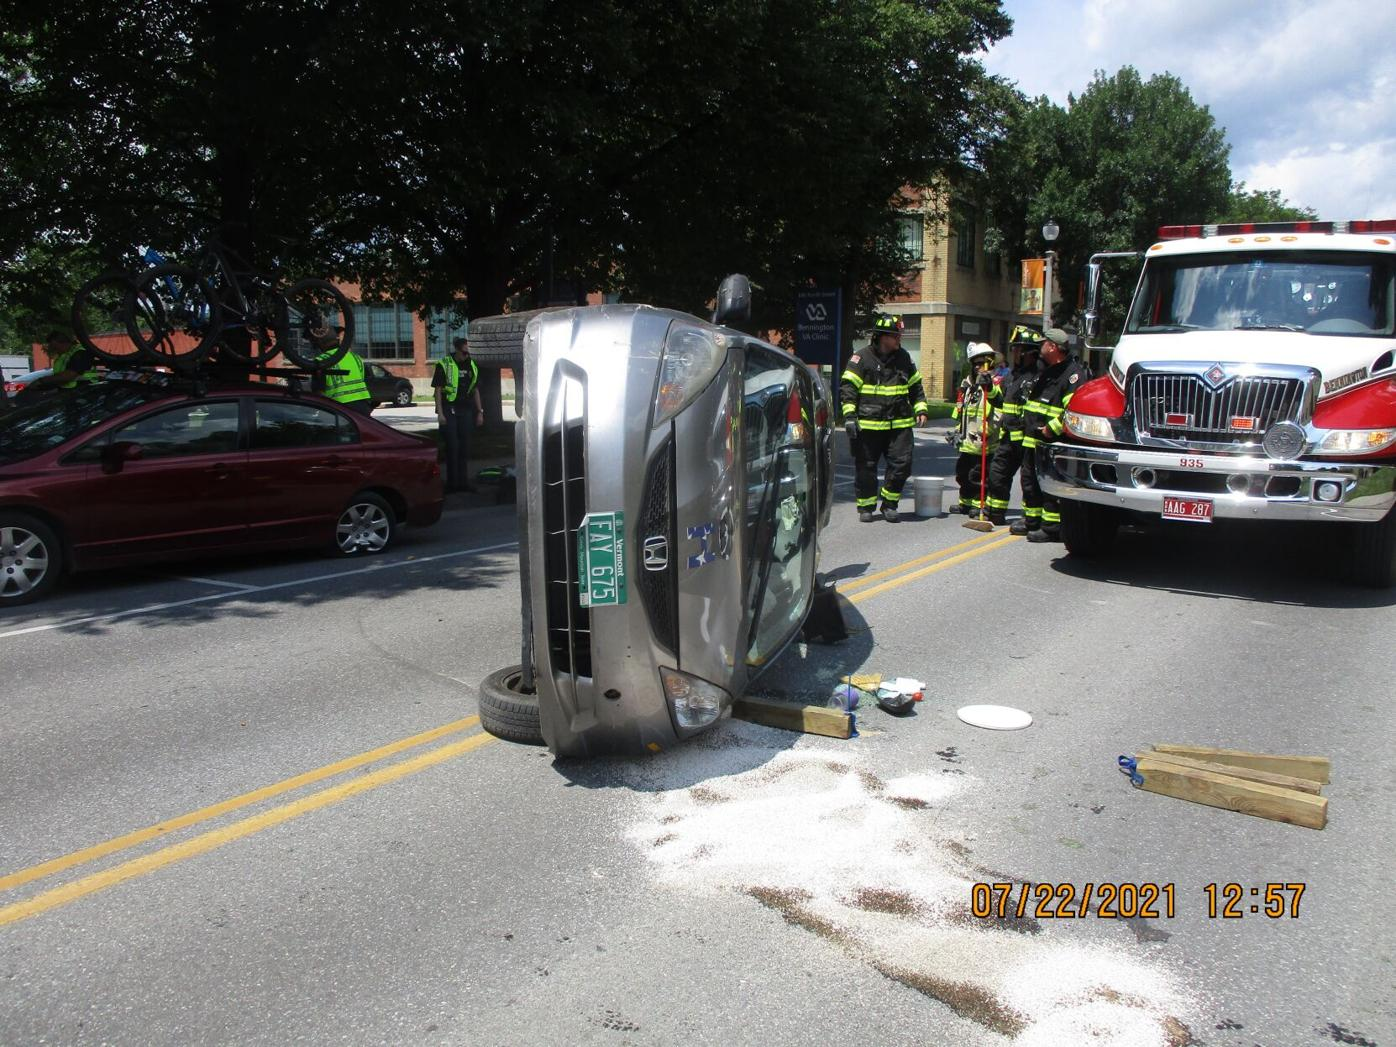 Rollover crash on North Street, Bennington, 7/22/21